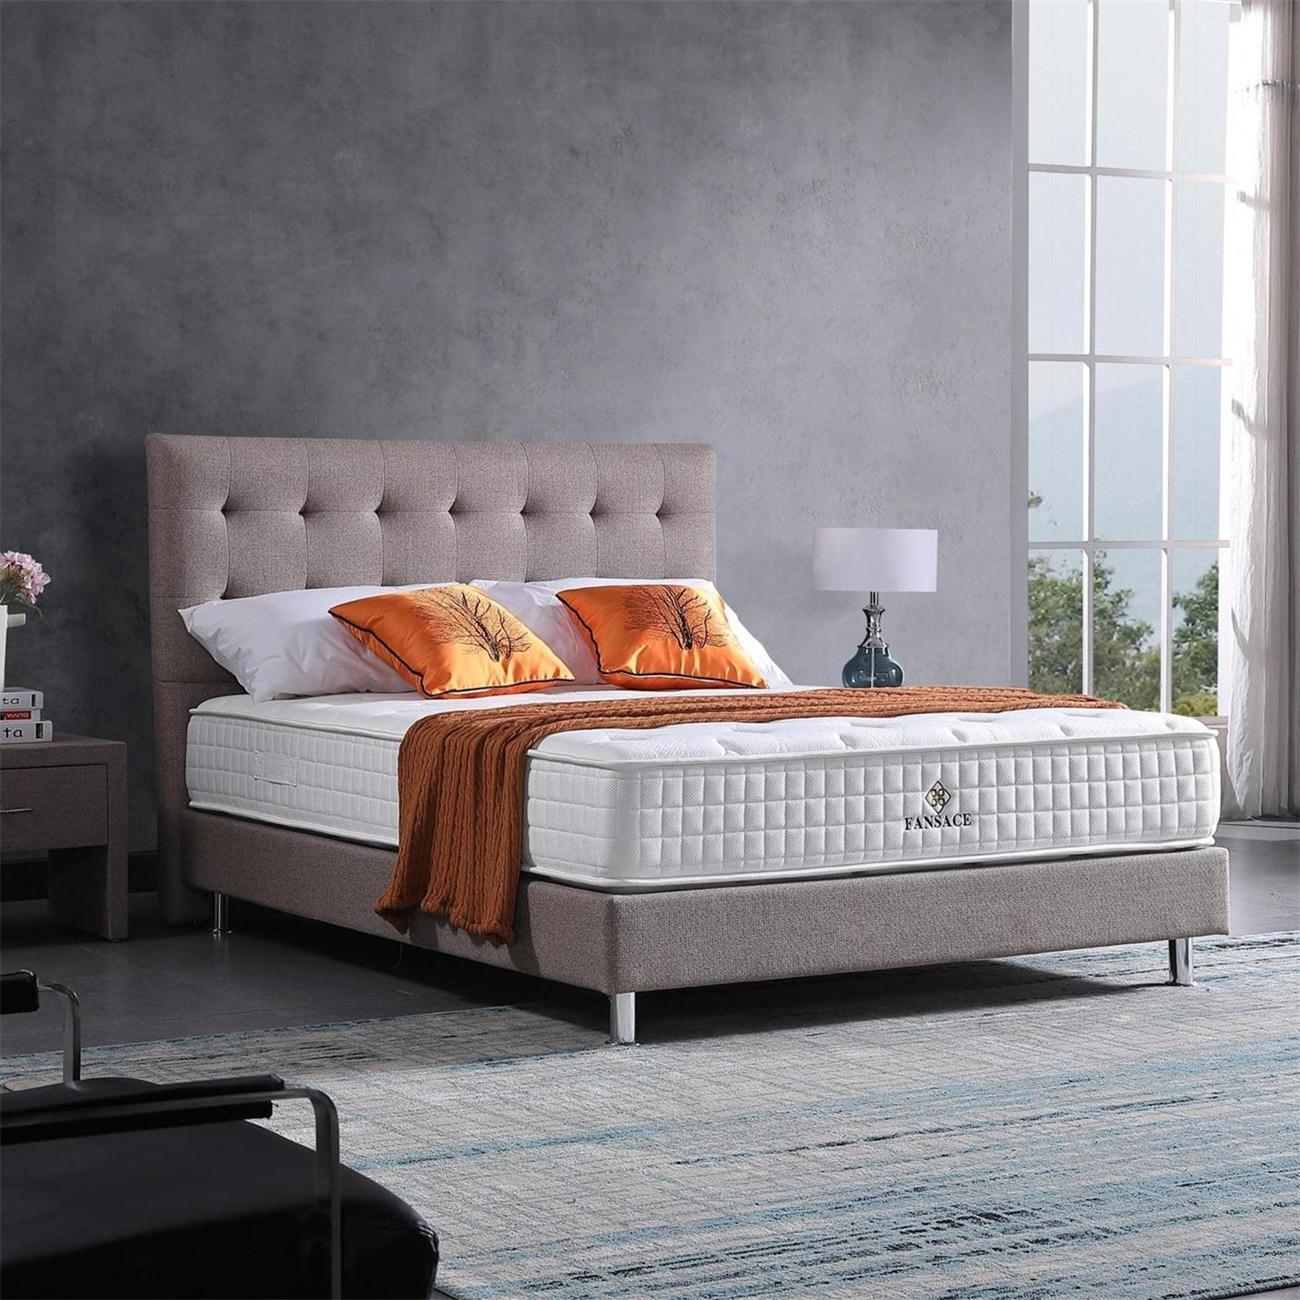 JLH comfortable kingsdown mattress prices for Home for bedroom-2